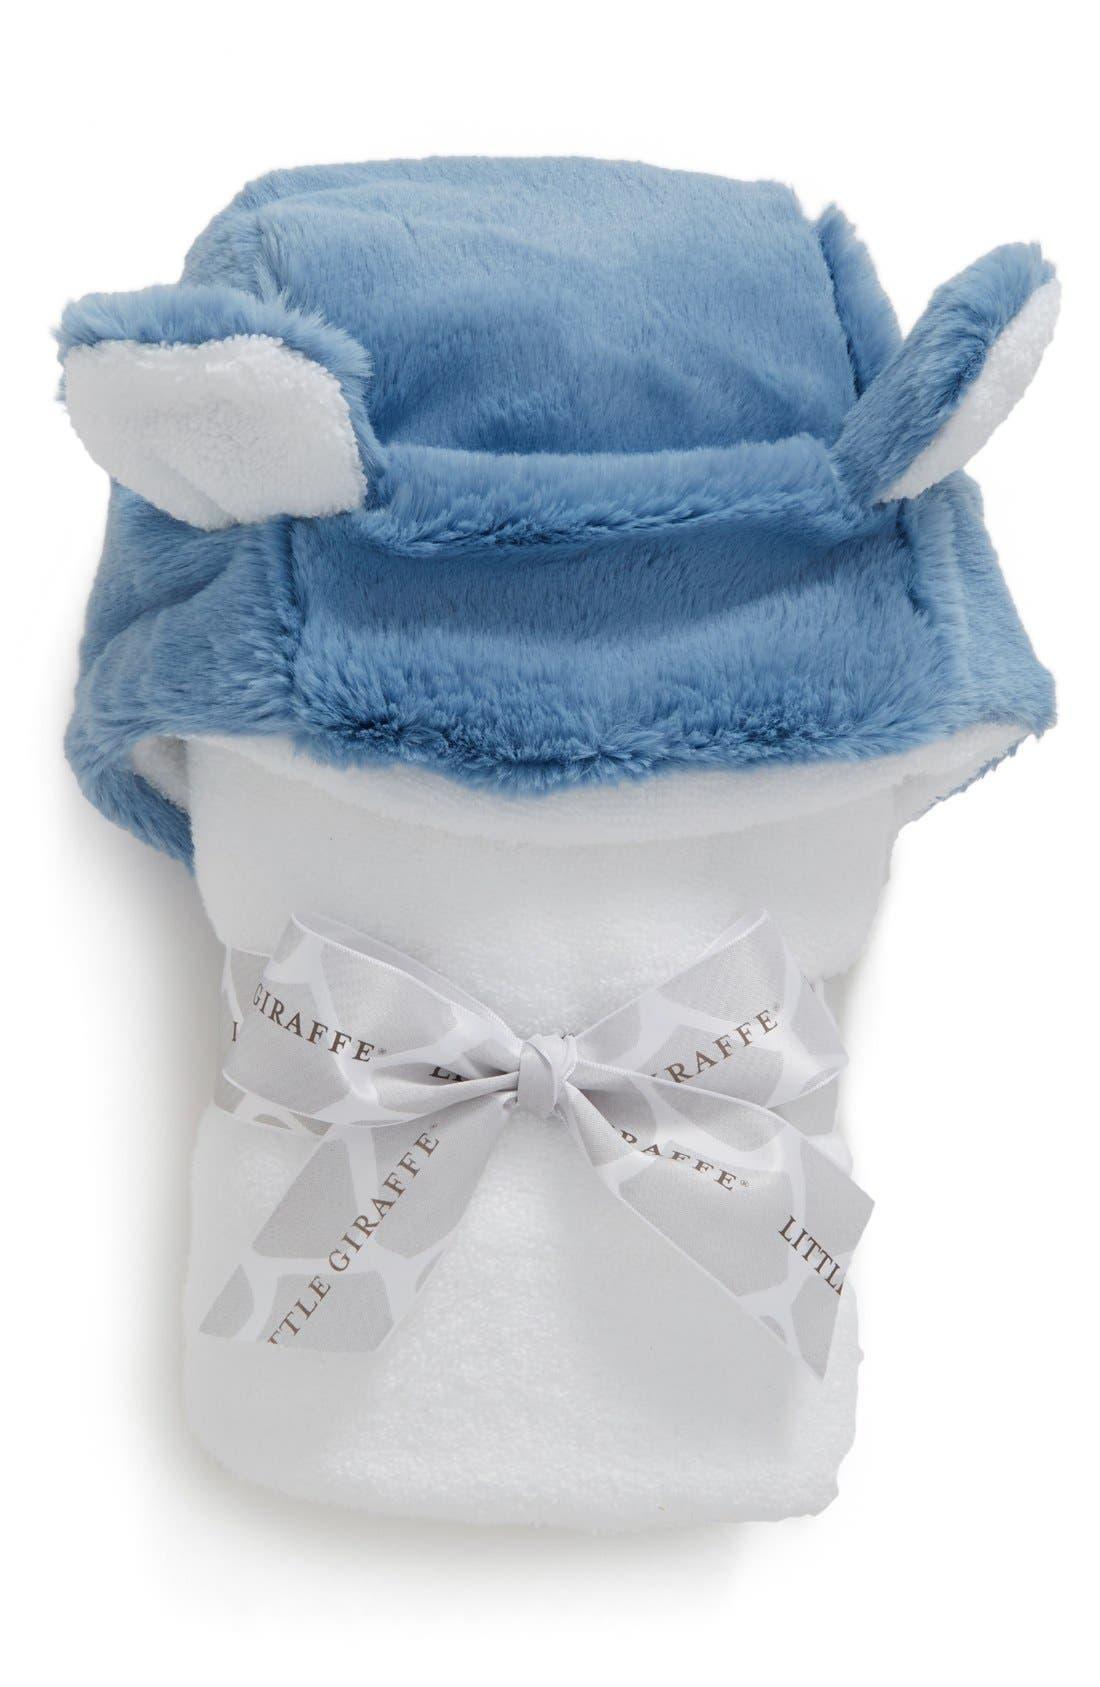 Hooded Towels & Robes Baby Bathing & Health | Nordstrom